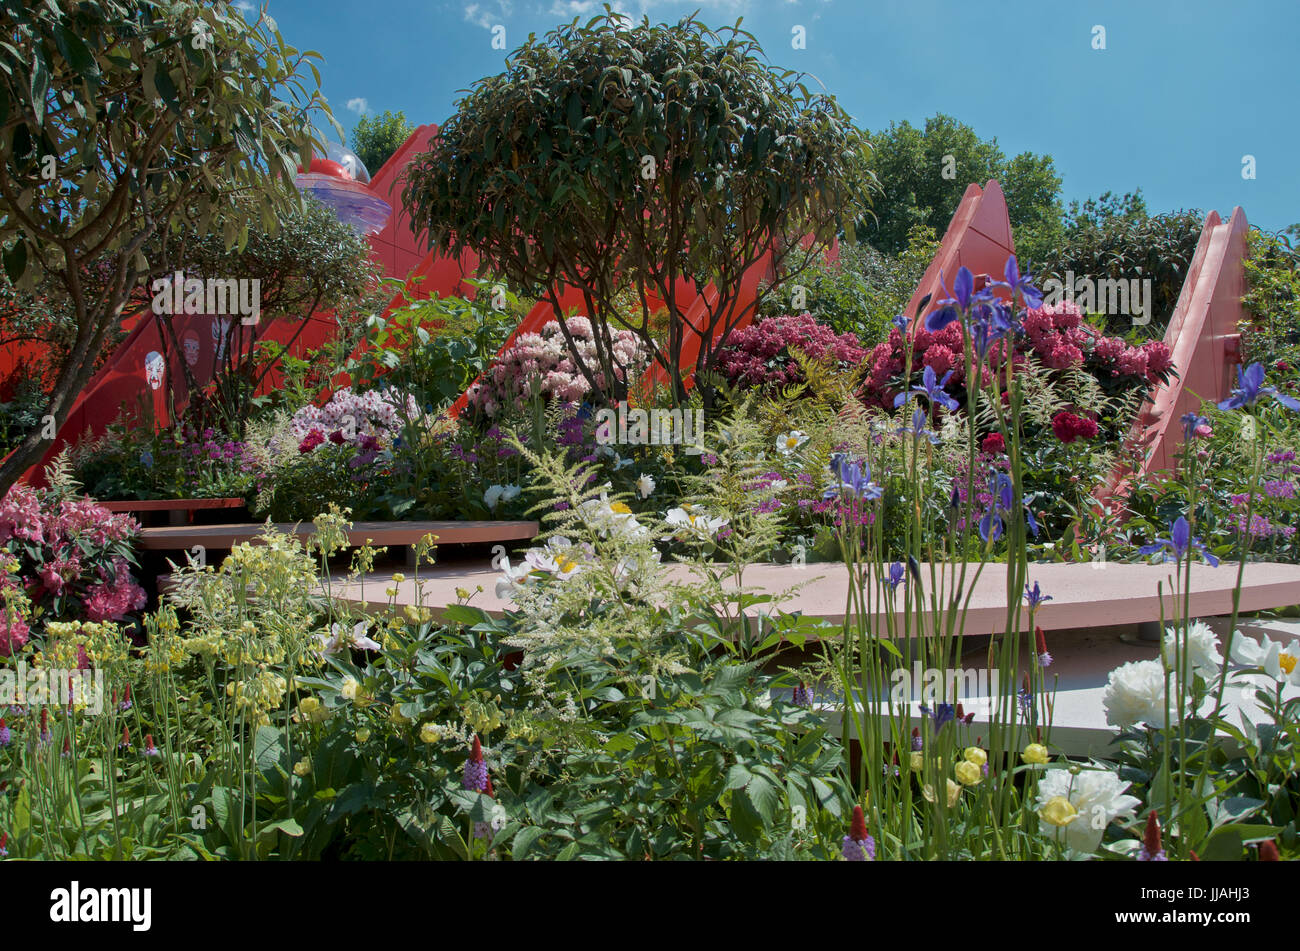 The Silk Road Garden at RHS Chelsea